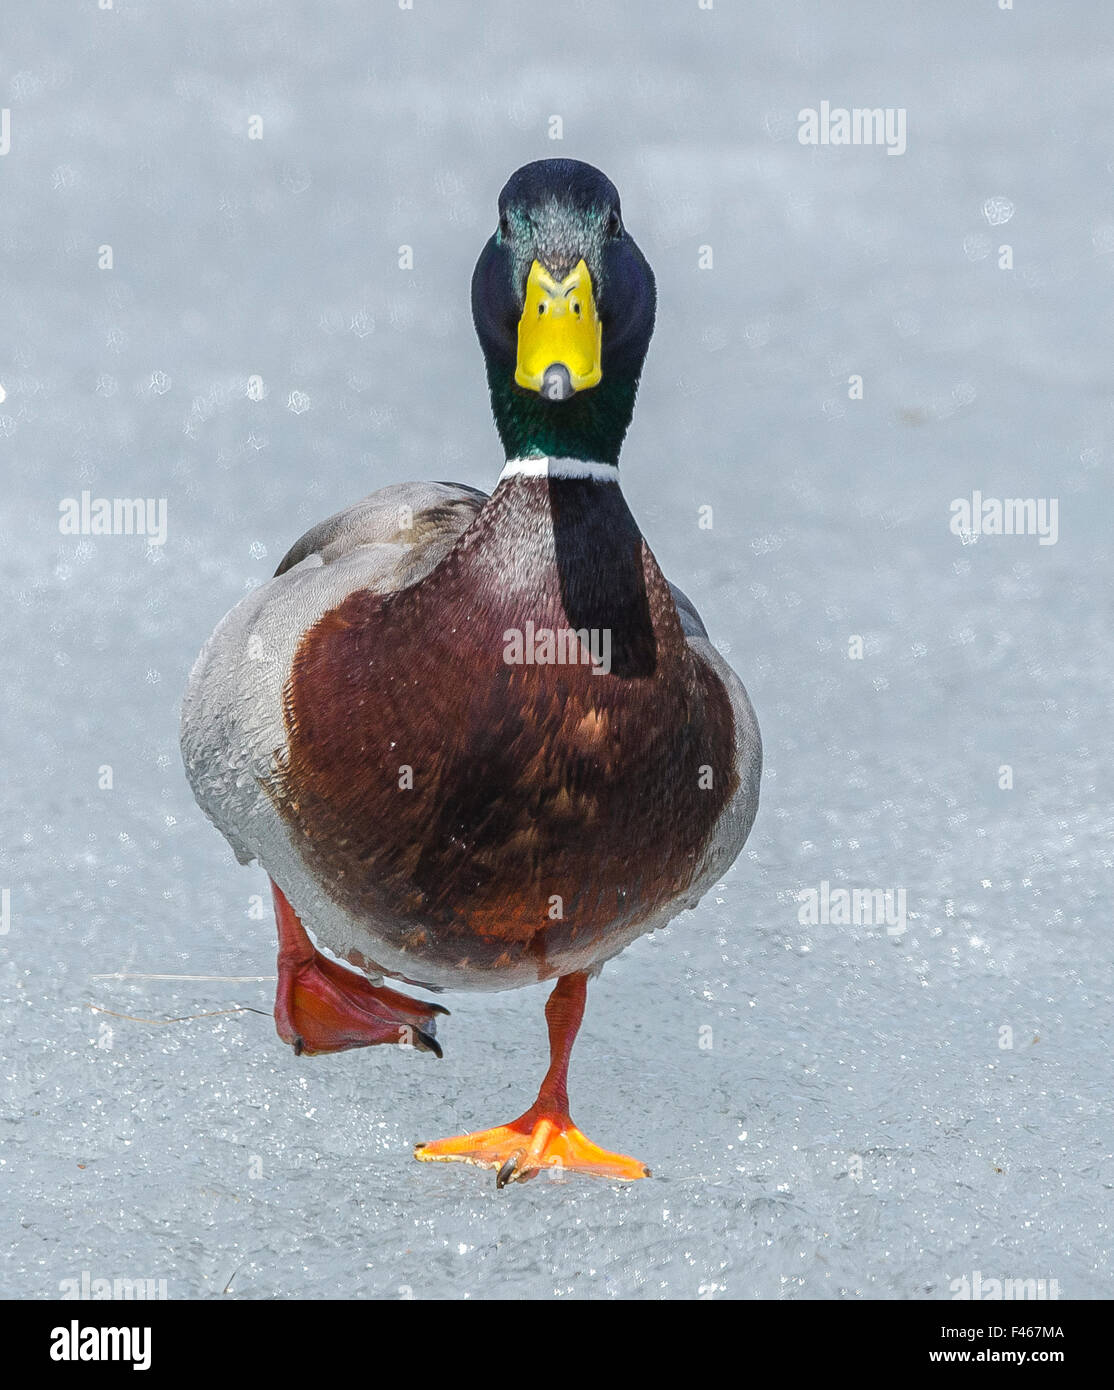 Mallard (Anas platyrhynchos) walking on ice, Acadia National Park, Maine, USA, April. - Stock Image